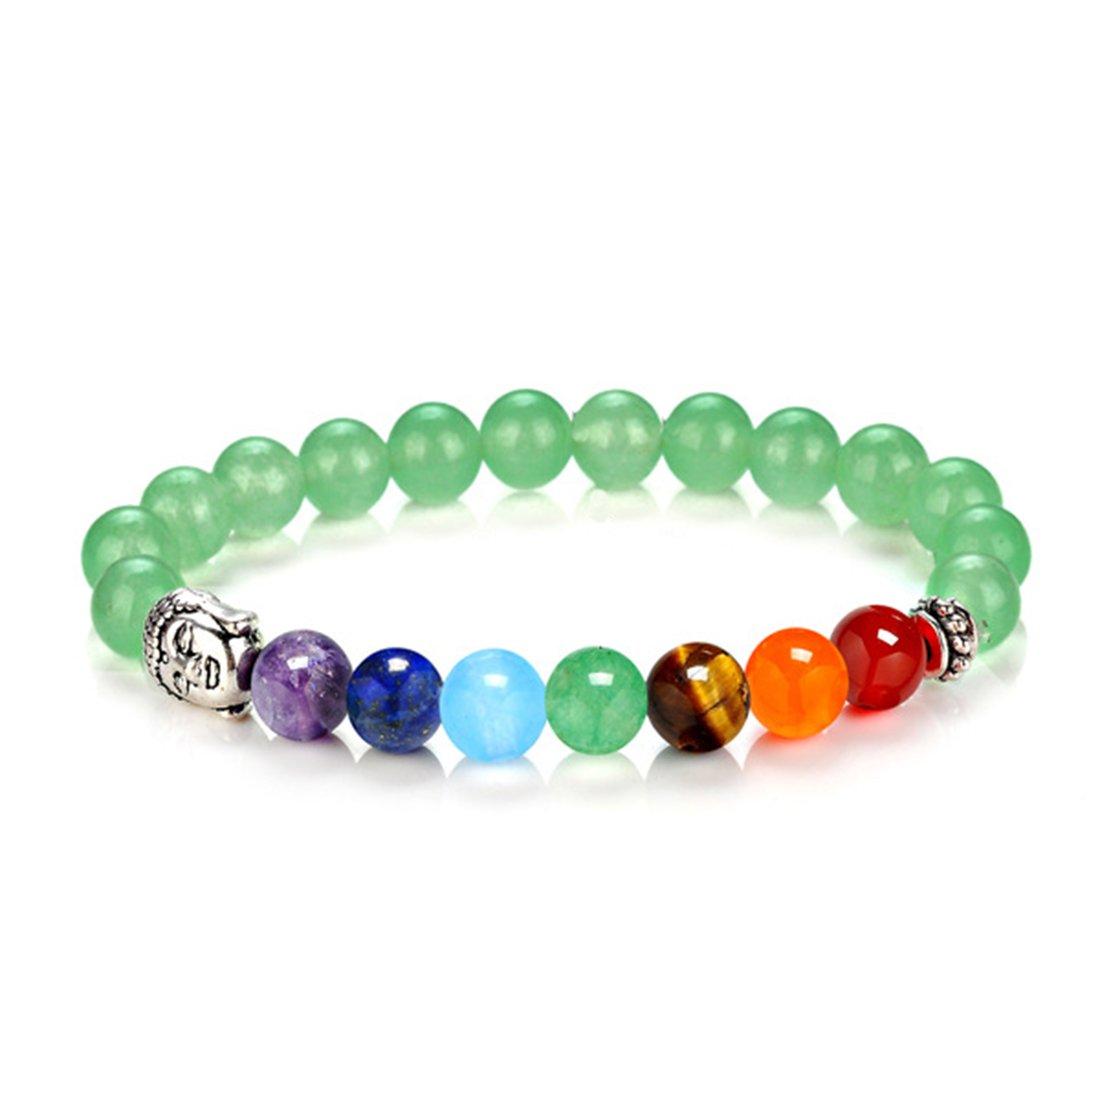 8mm 7 Chakra Natural Stone Yoga Buddha Bracelet Healing Energy Beads Wristband CA-YJSL